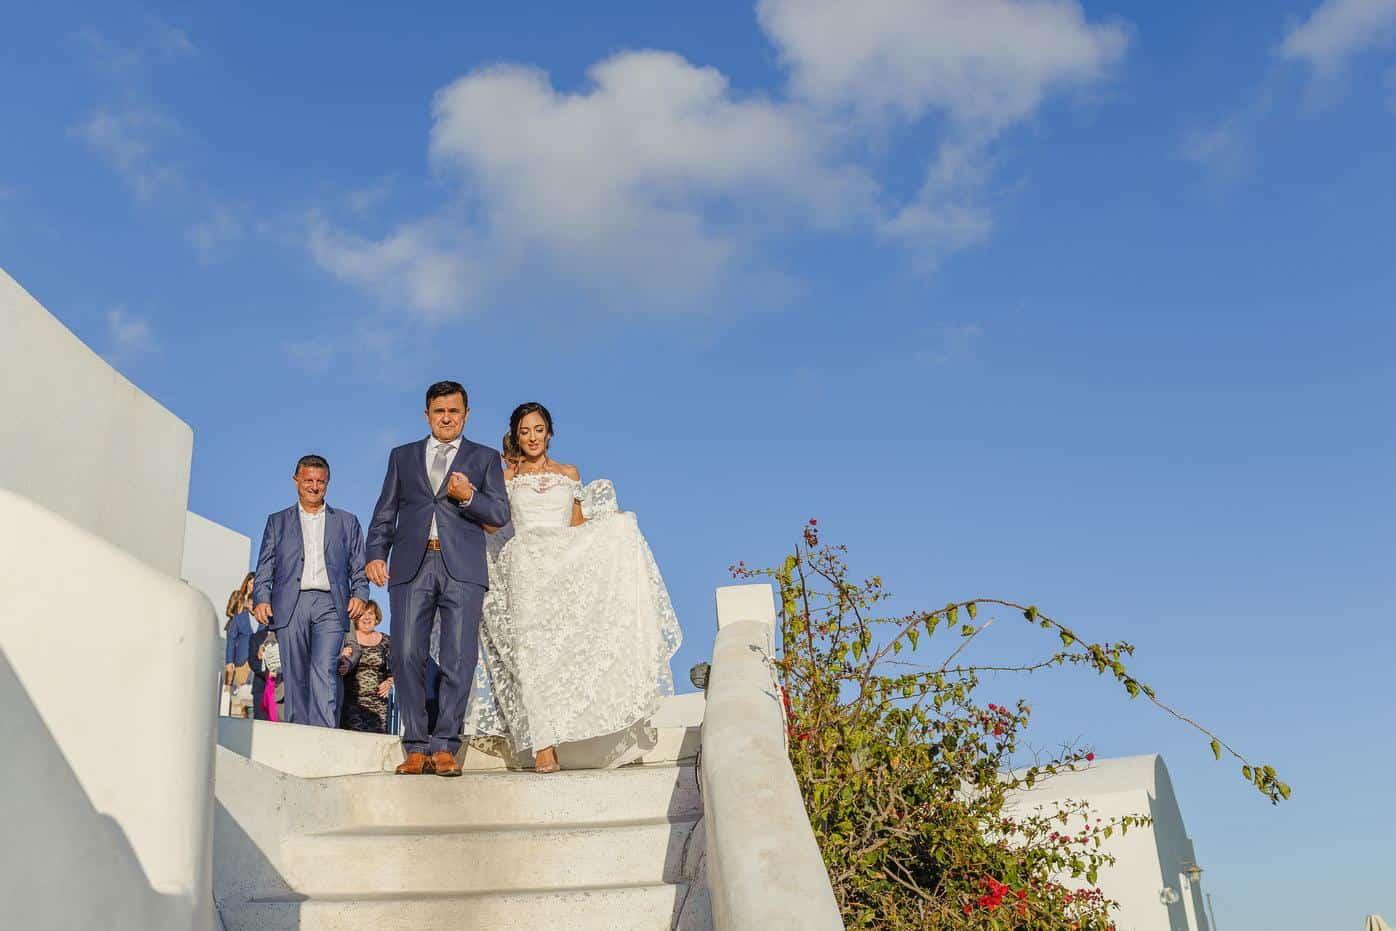 Photographic -  Destination wedding photography 1956 KONSTANTINOS & GEORGIA | WEDDING IN SANTORINI